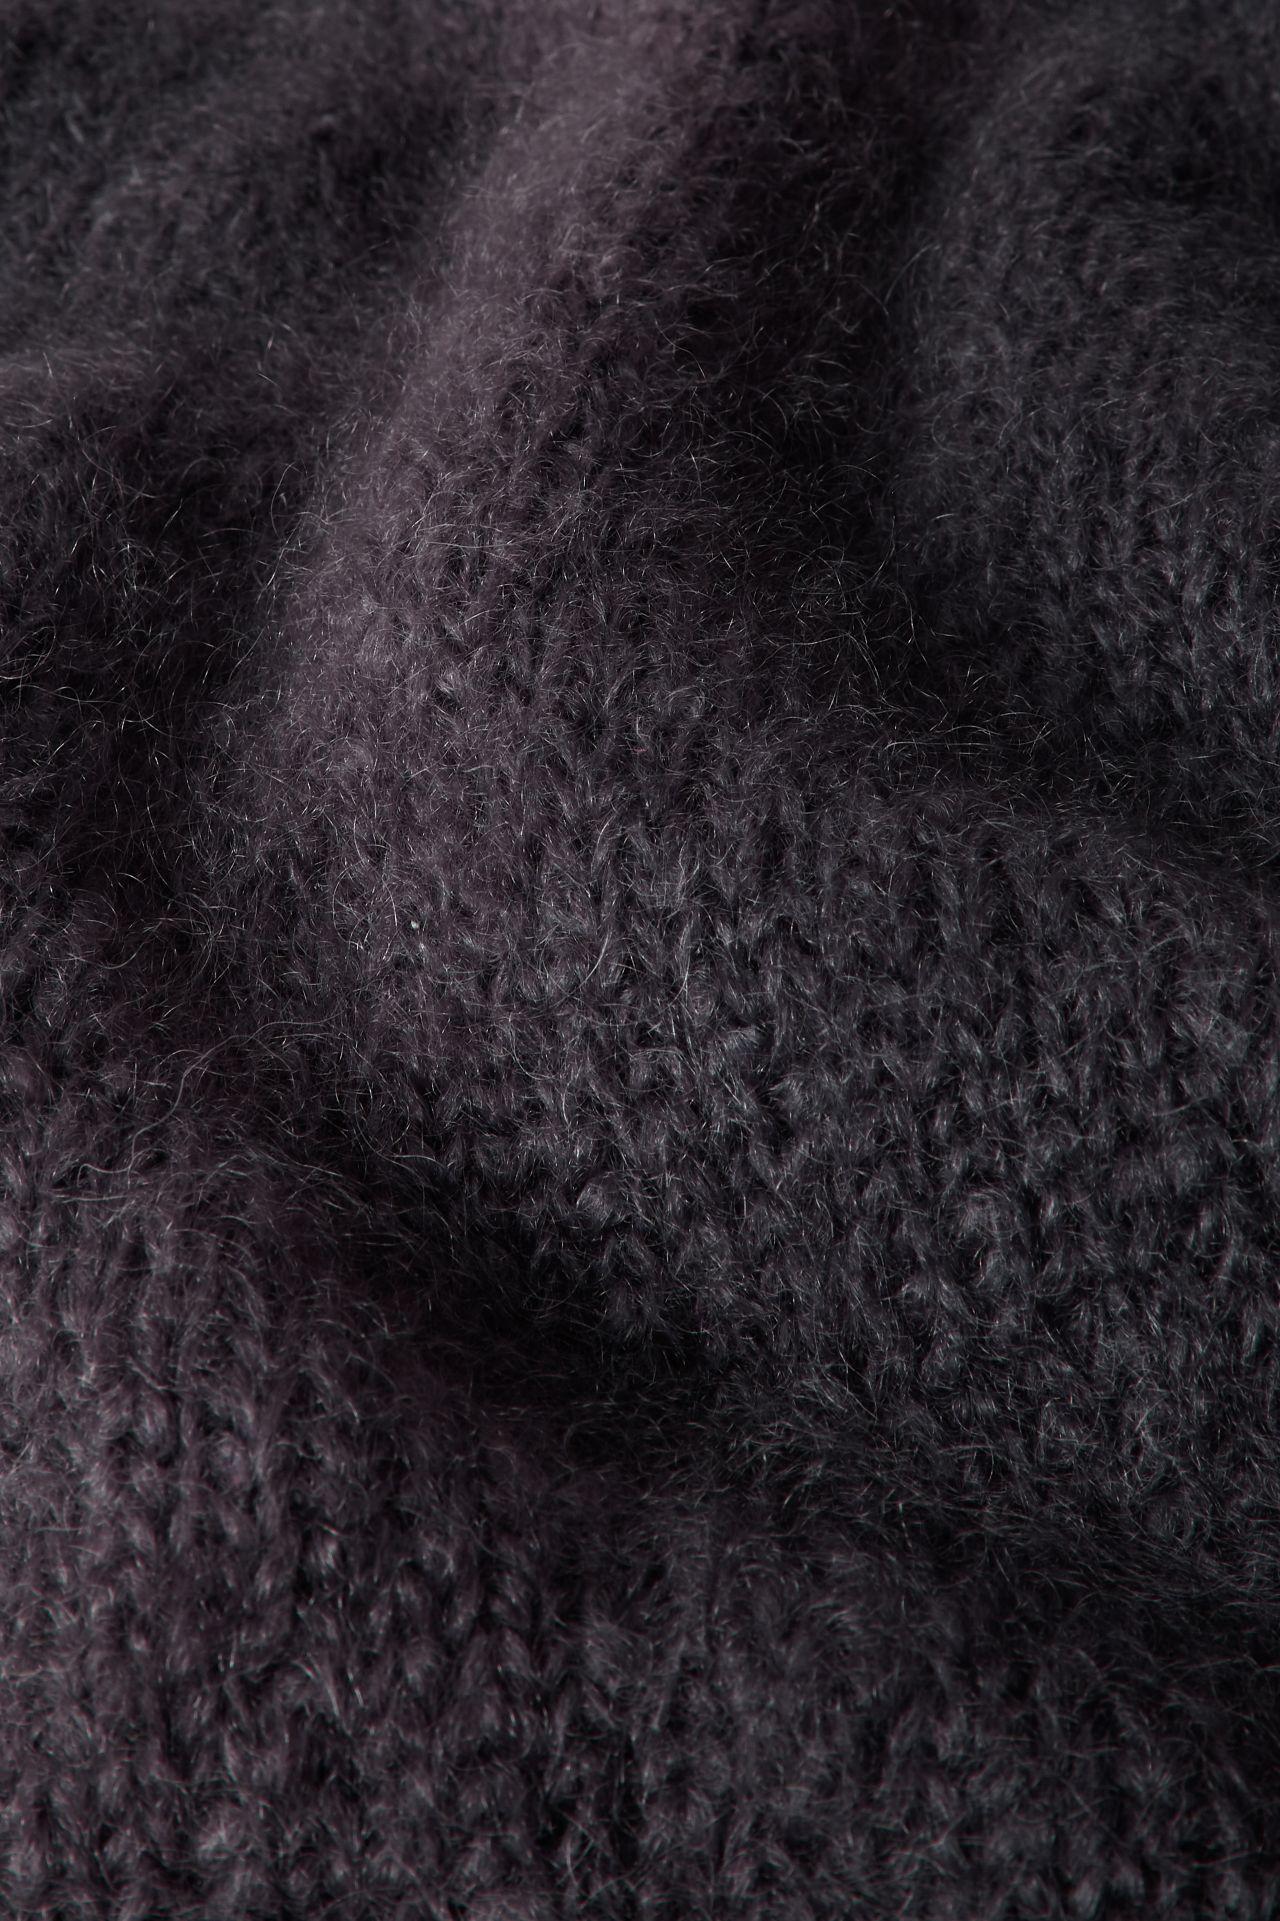 Mohair yarn dark grey knit detail.